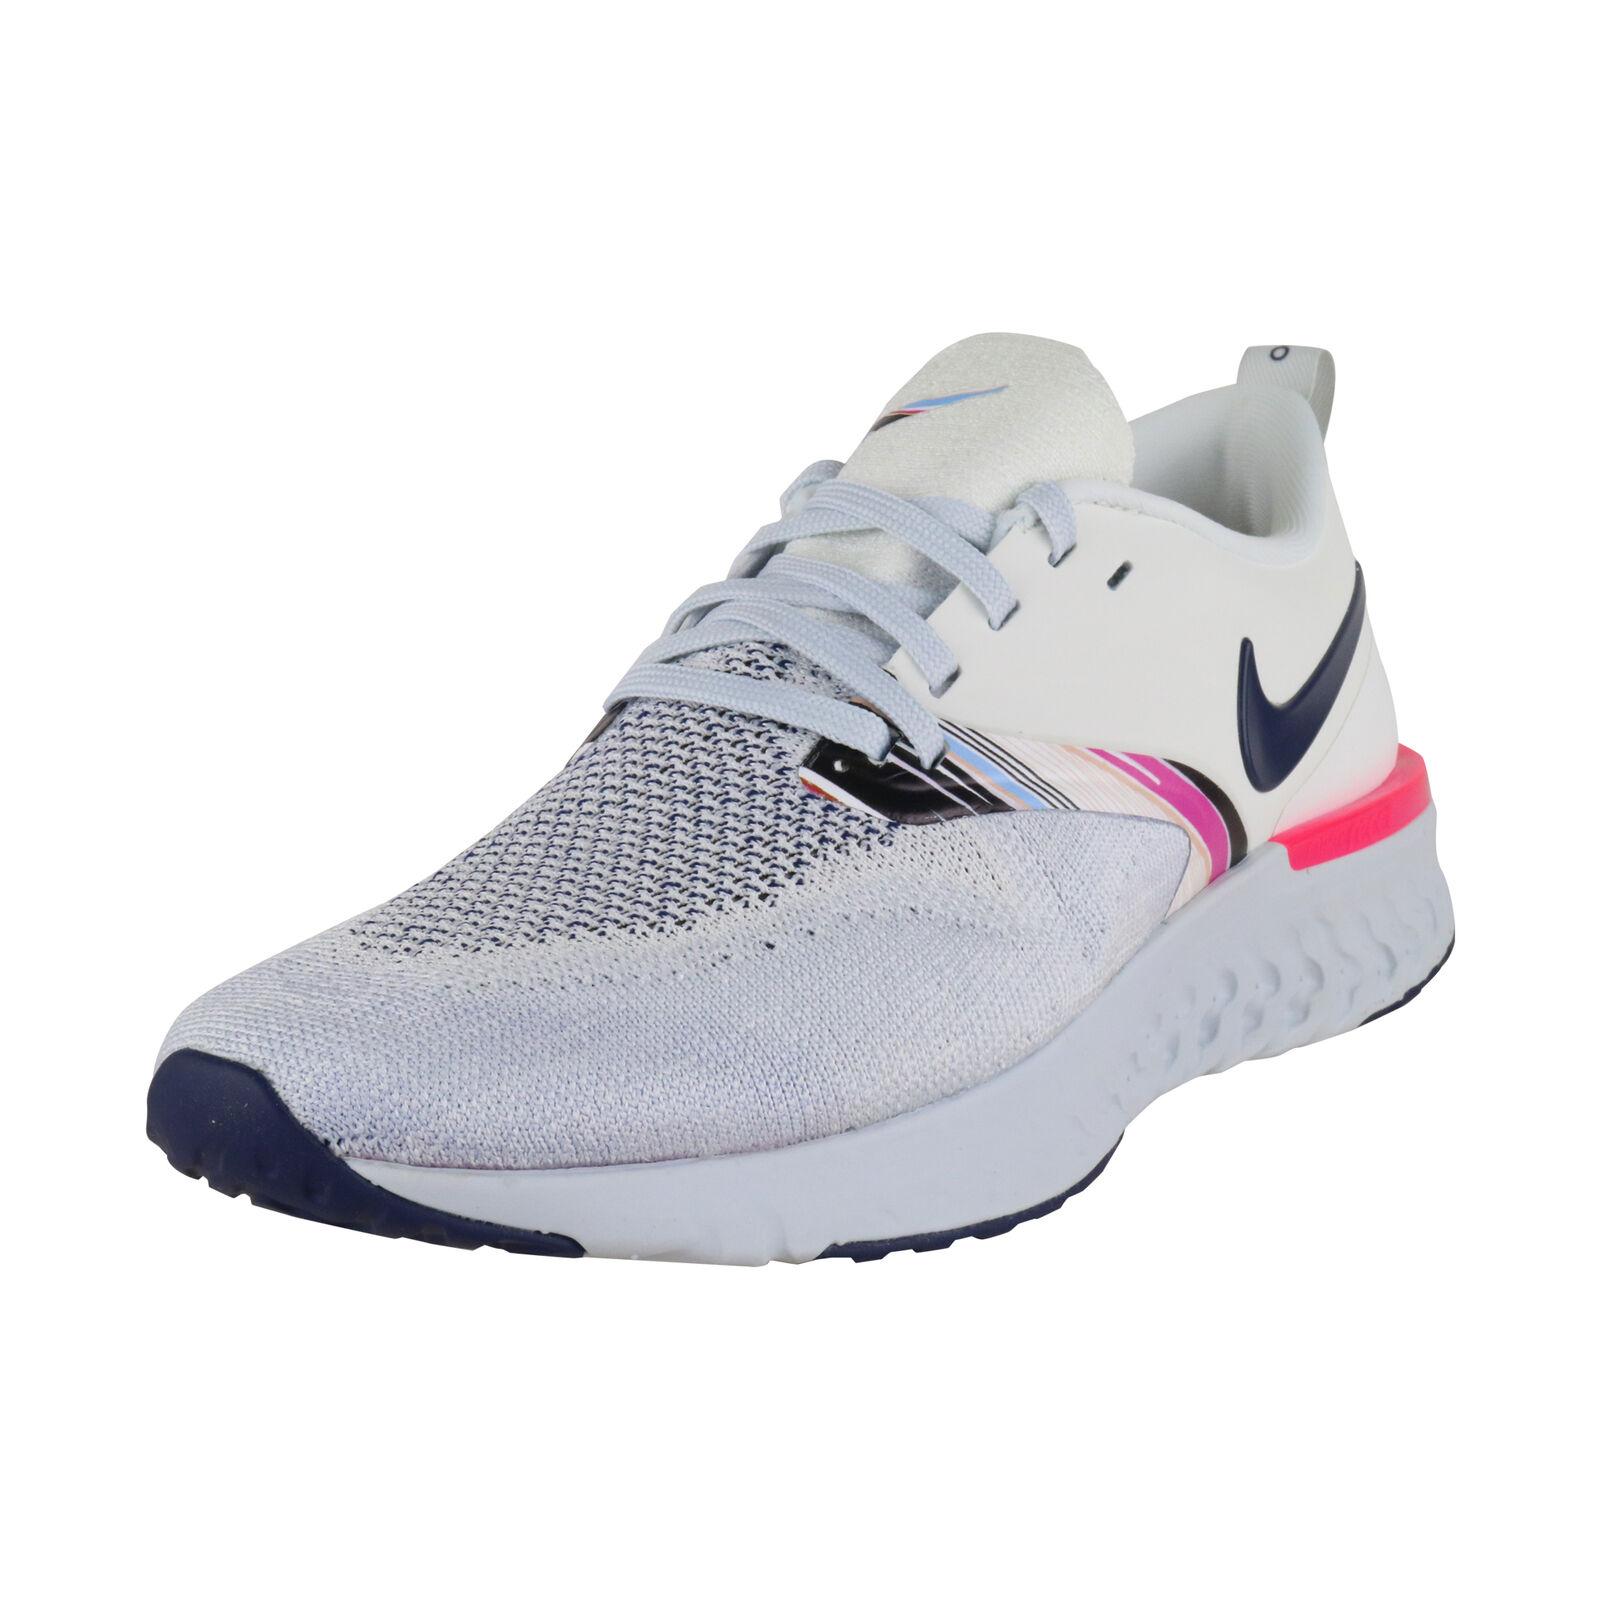 Nike Epic React Flyknit 2 Damen Laufschuh PinkSchwarz